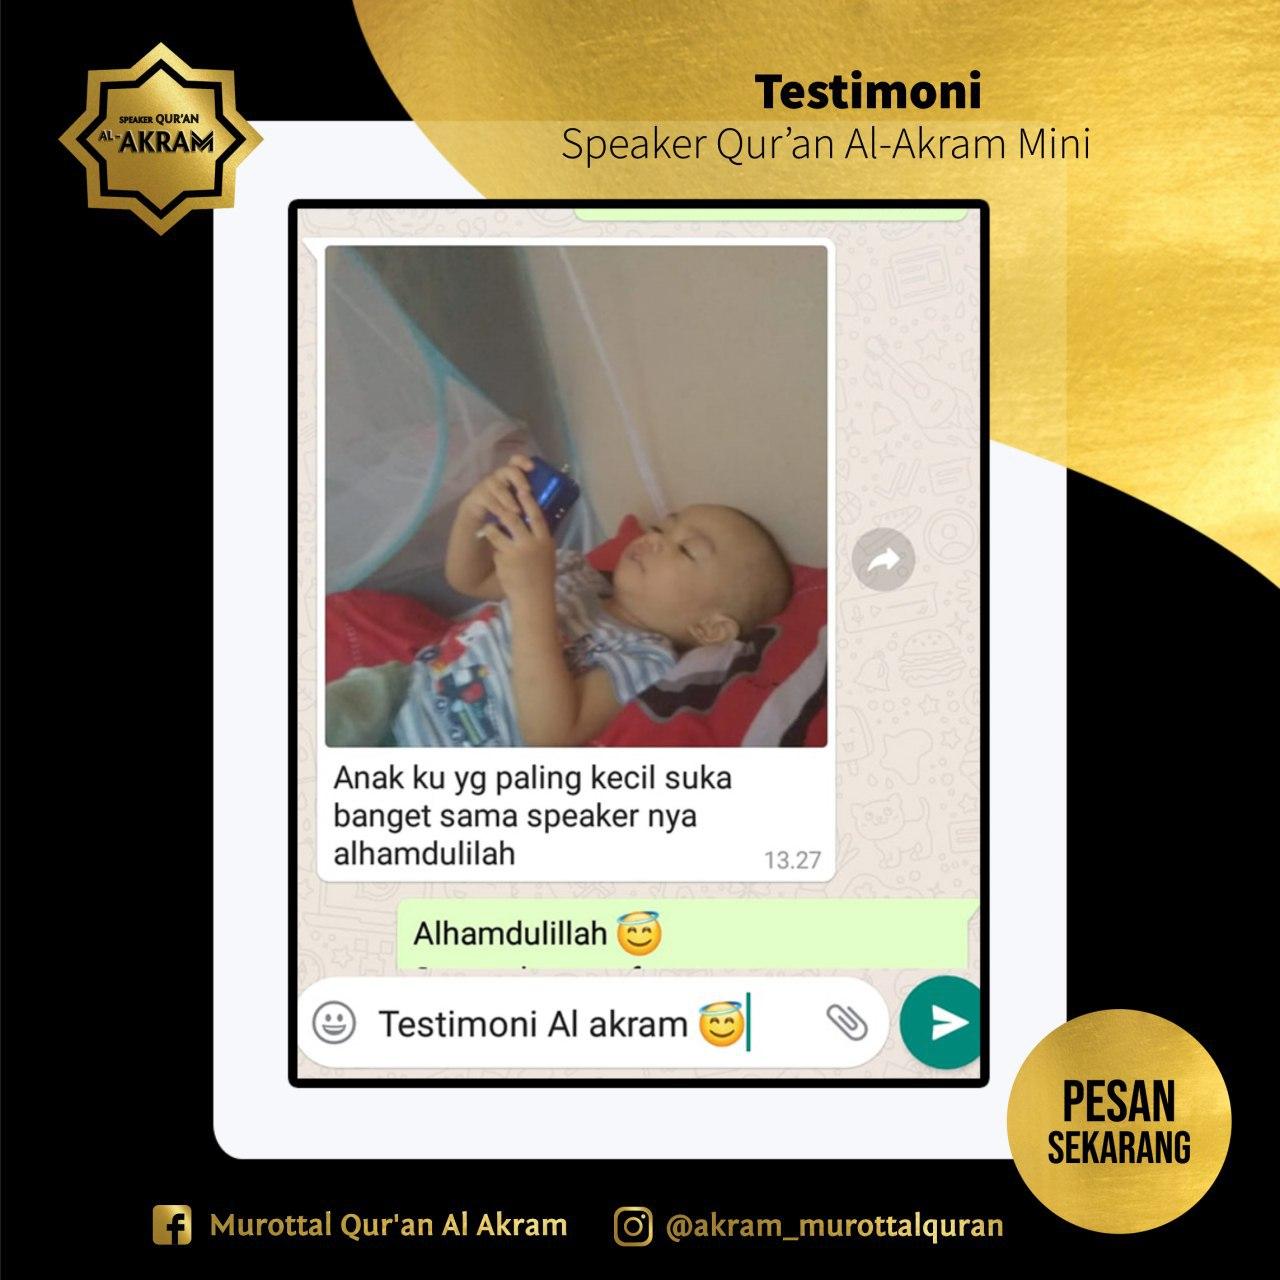 speaker-quran-alakram-testi7